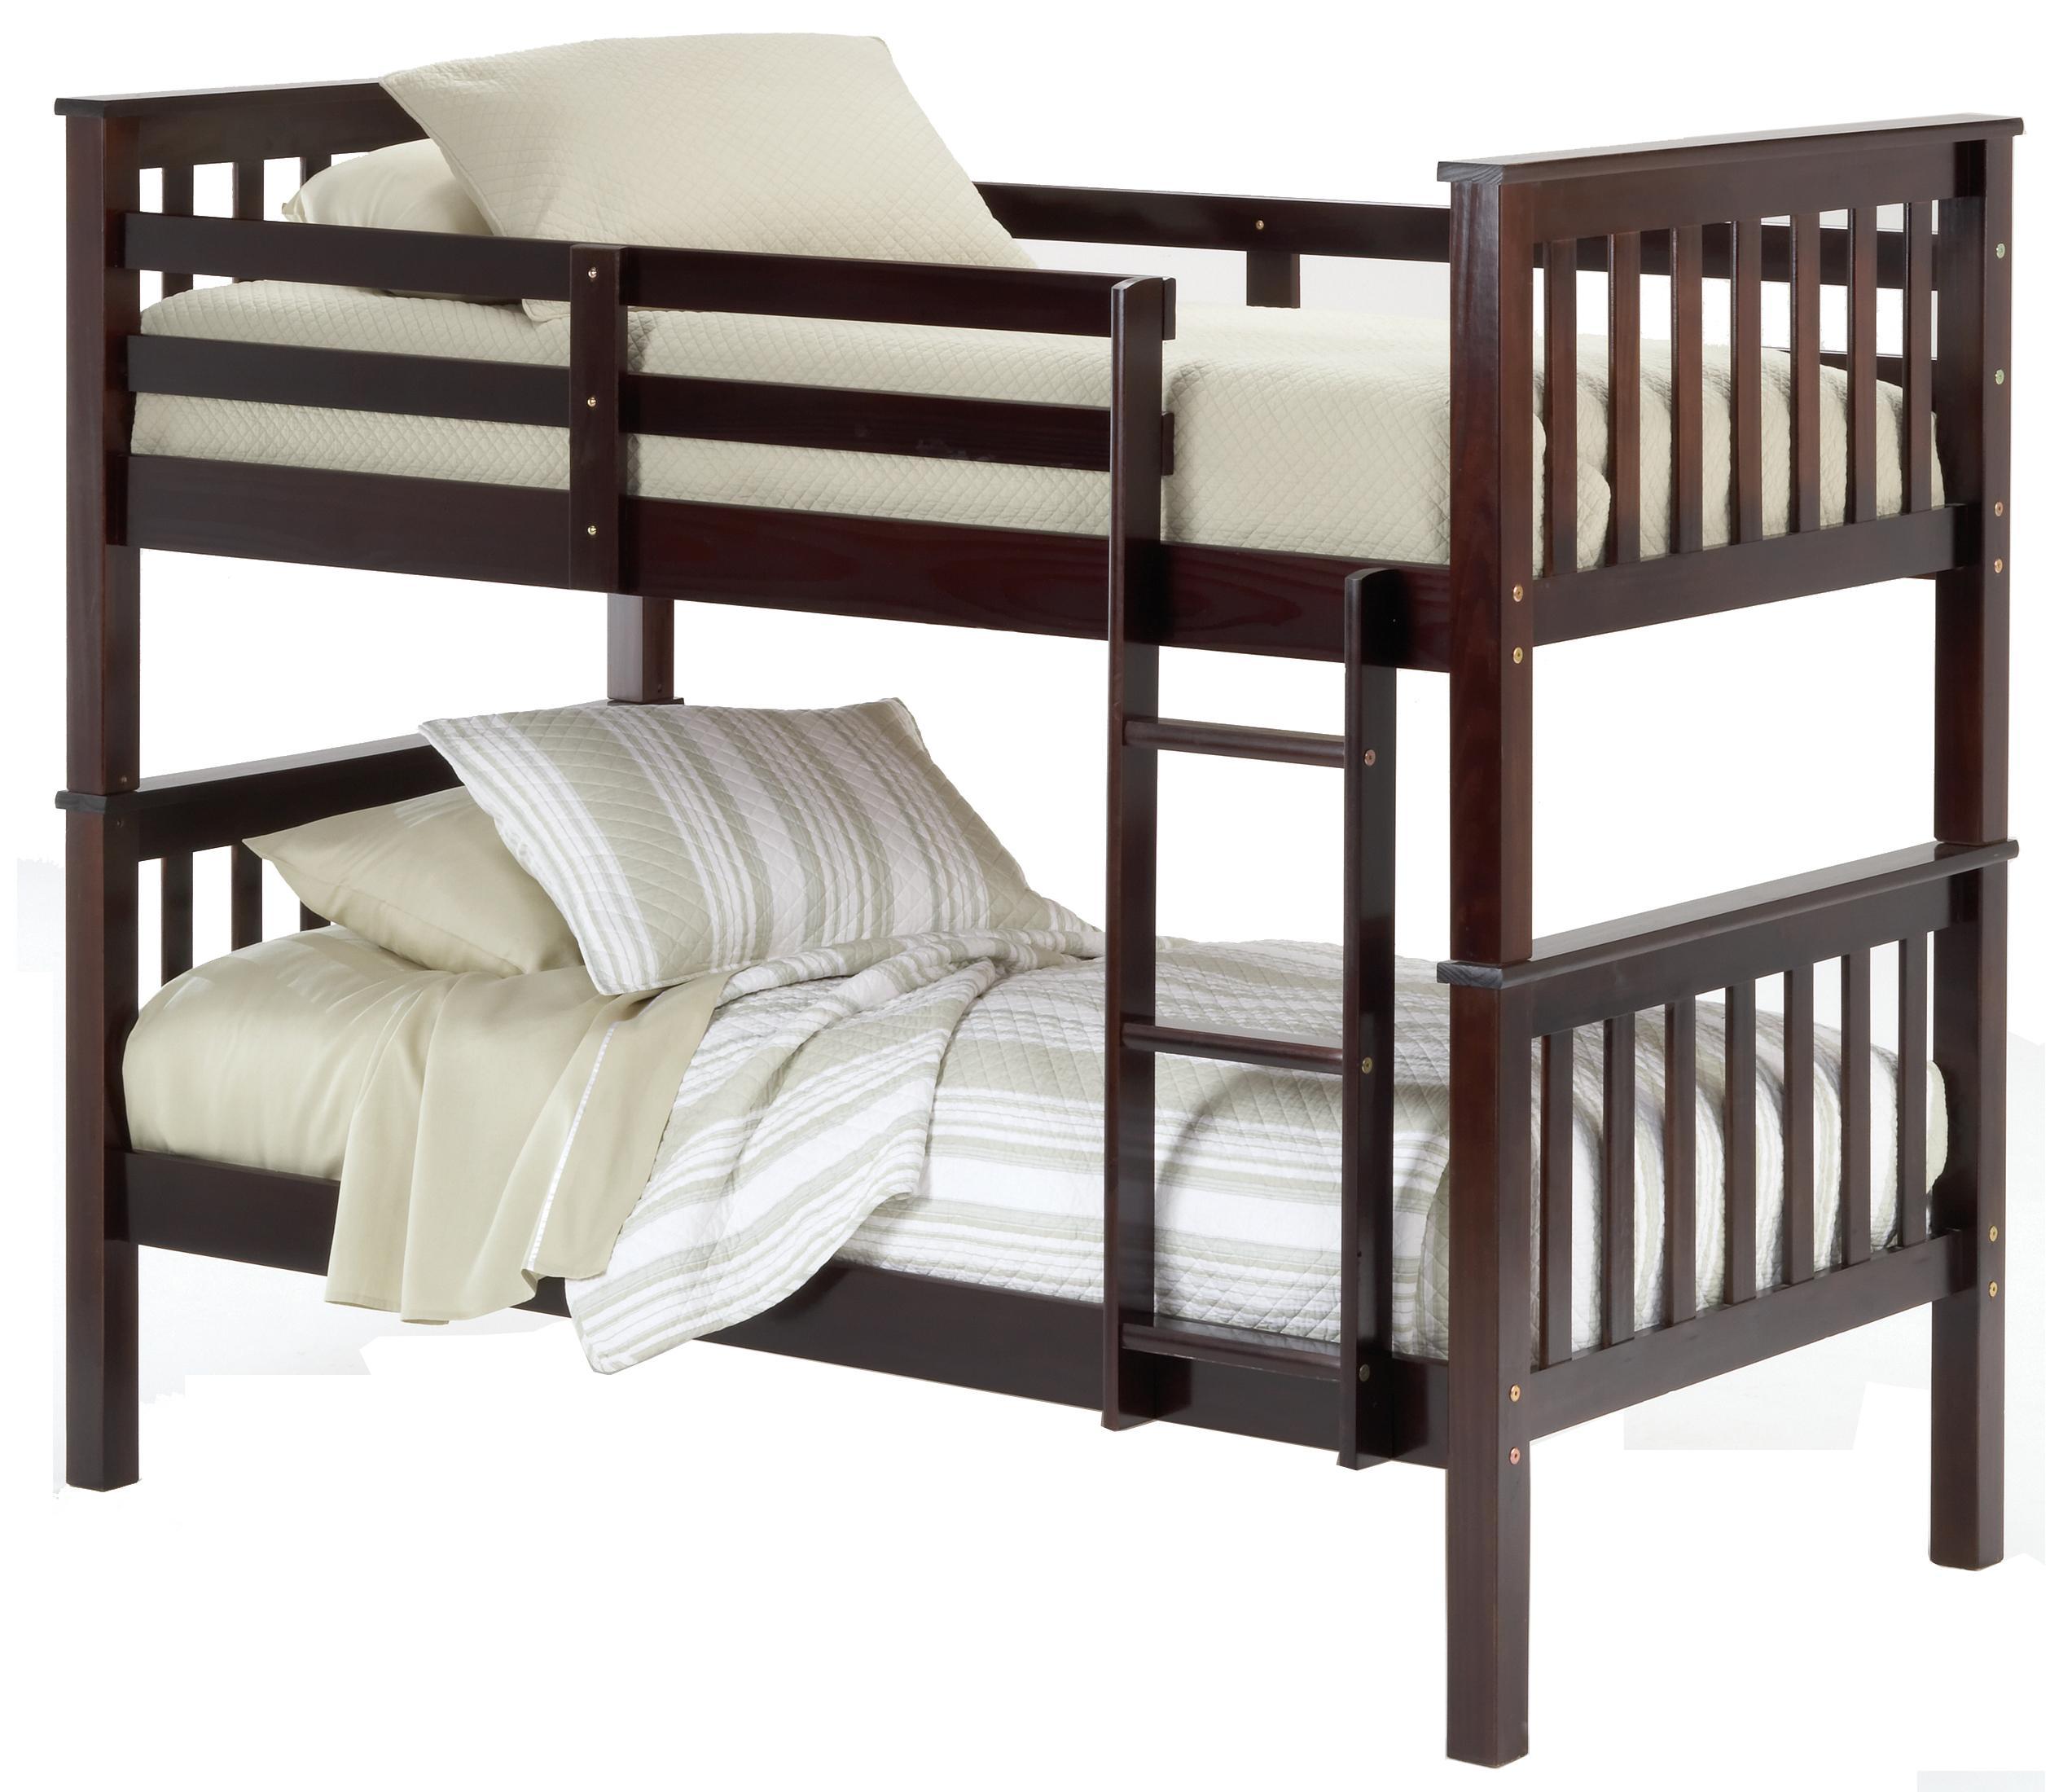 Sadler Twin Bunk Bed by Bernards at Westrich Furniture & Appliances